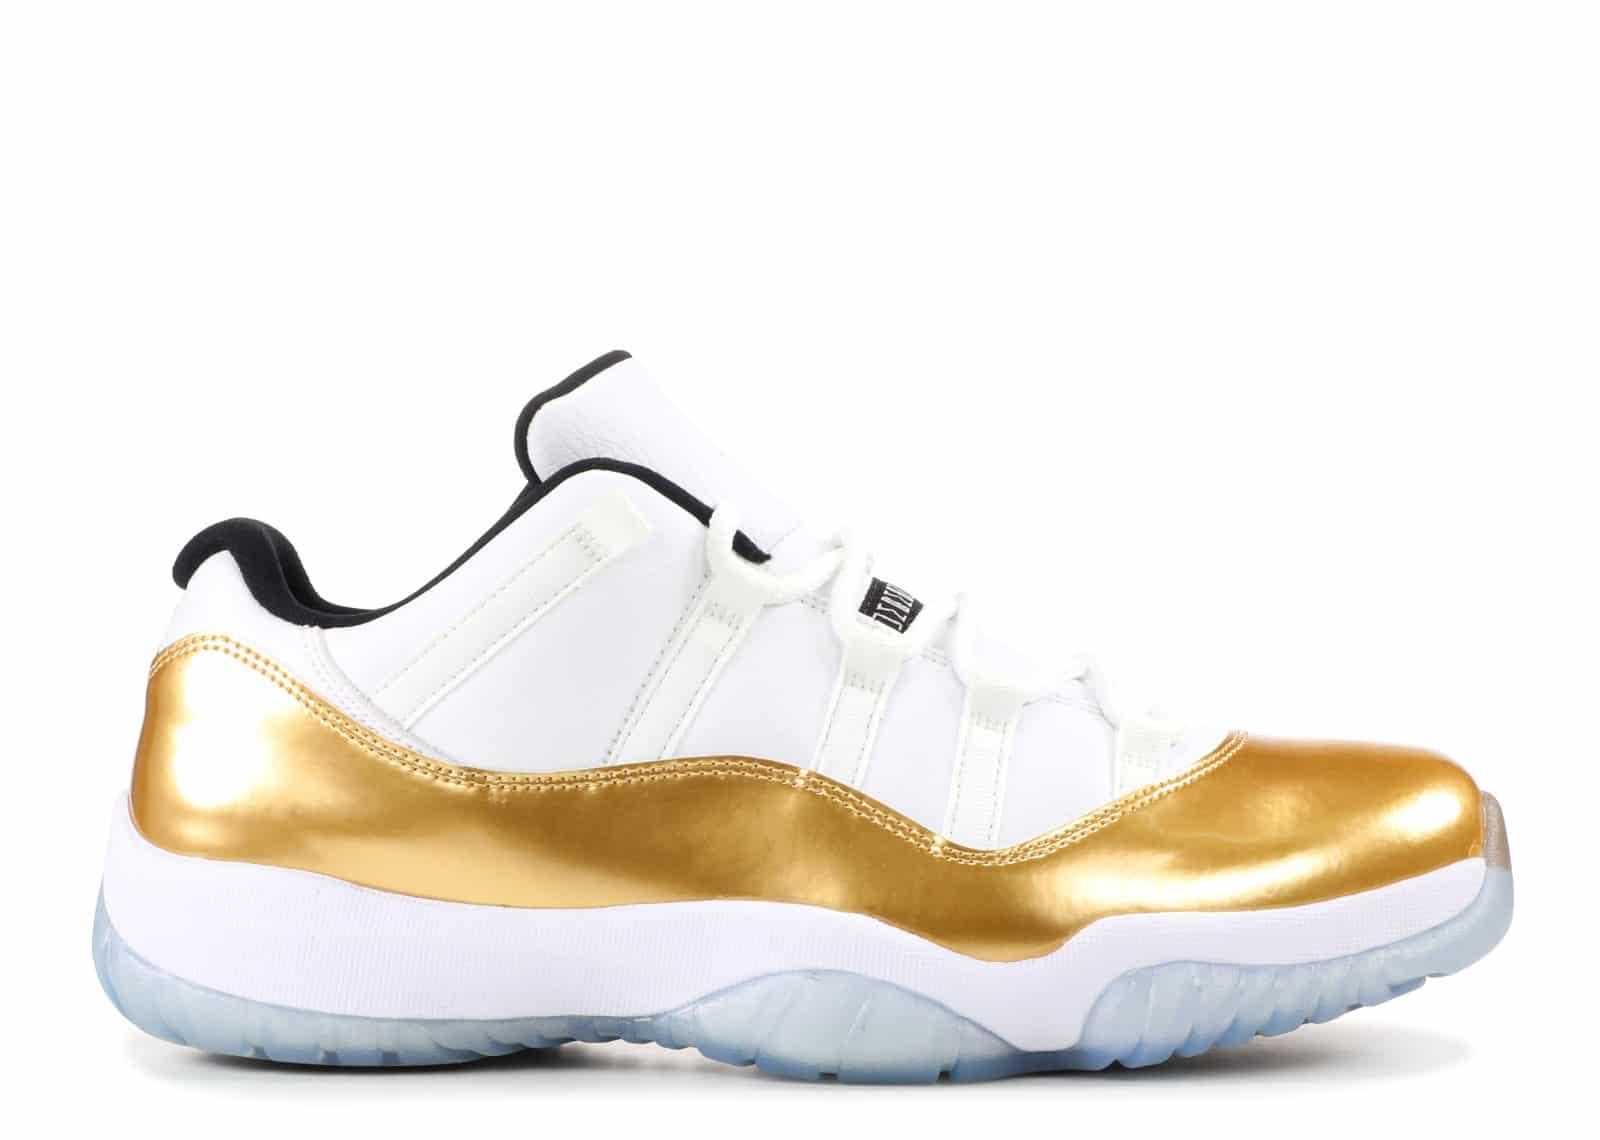 Air Jordan 11 Retro Low White/ Gold